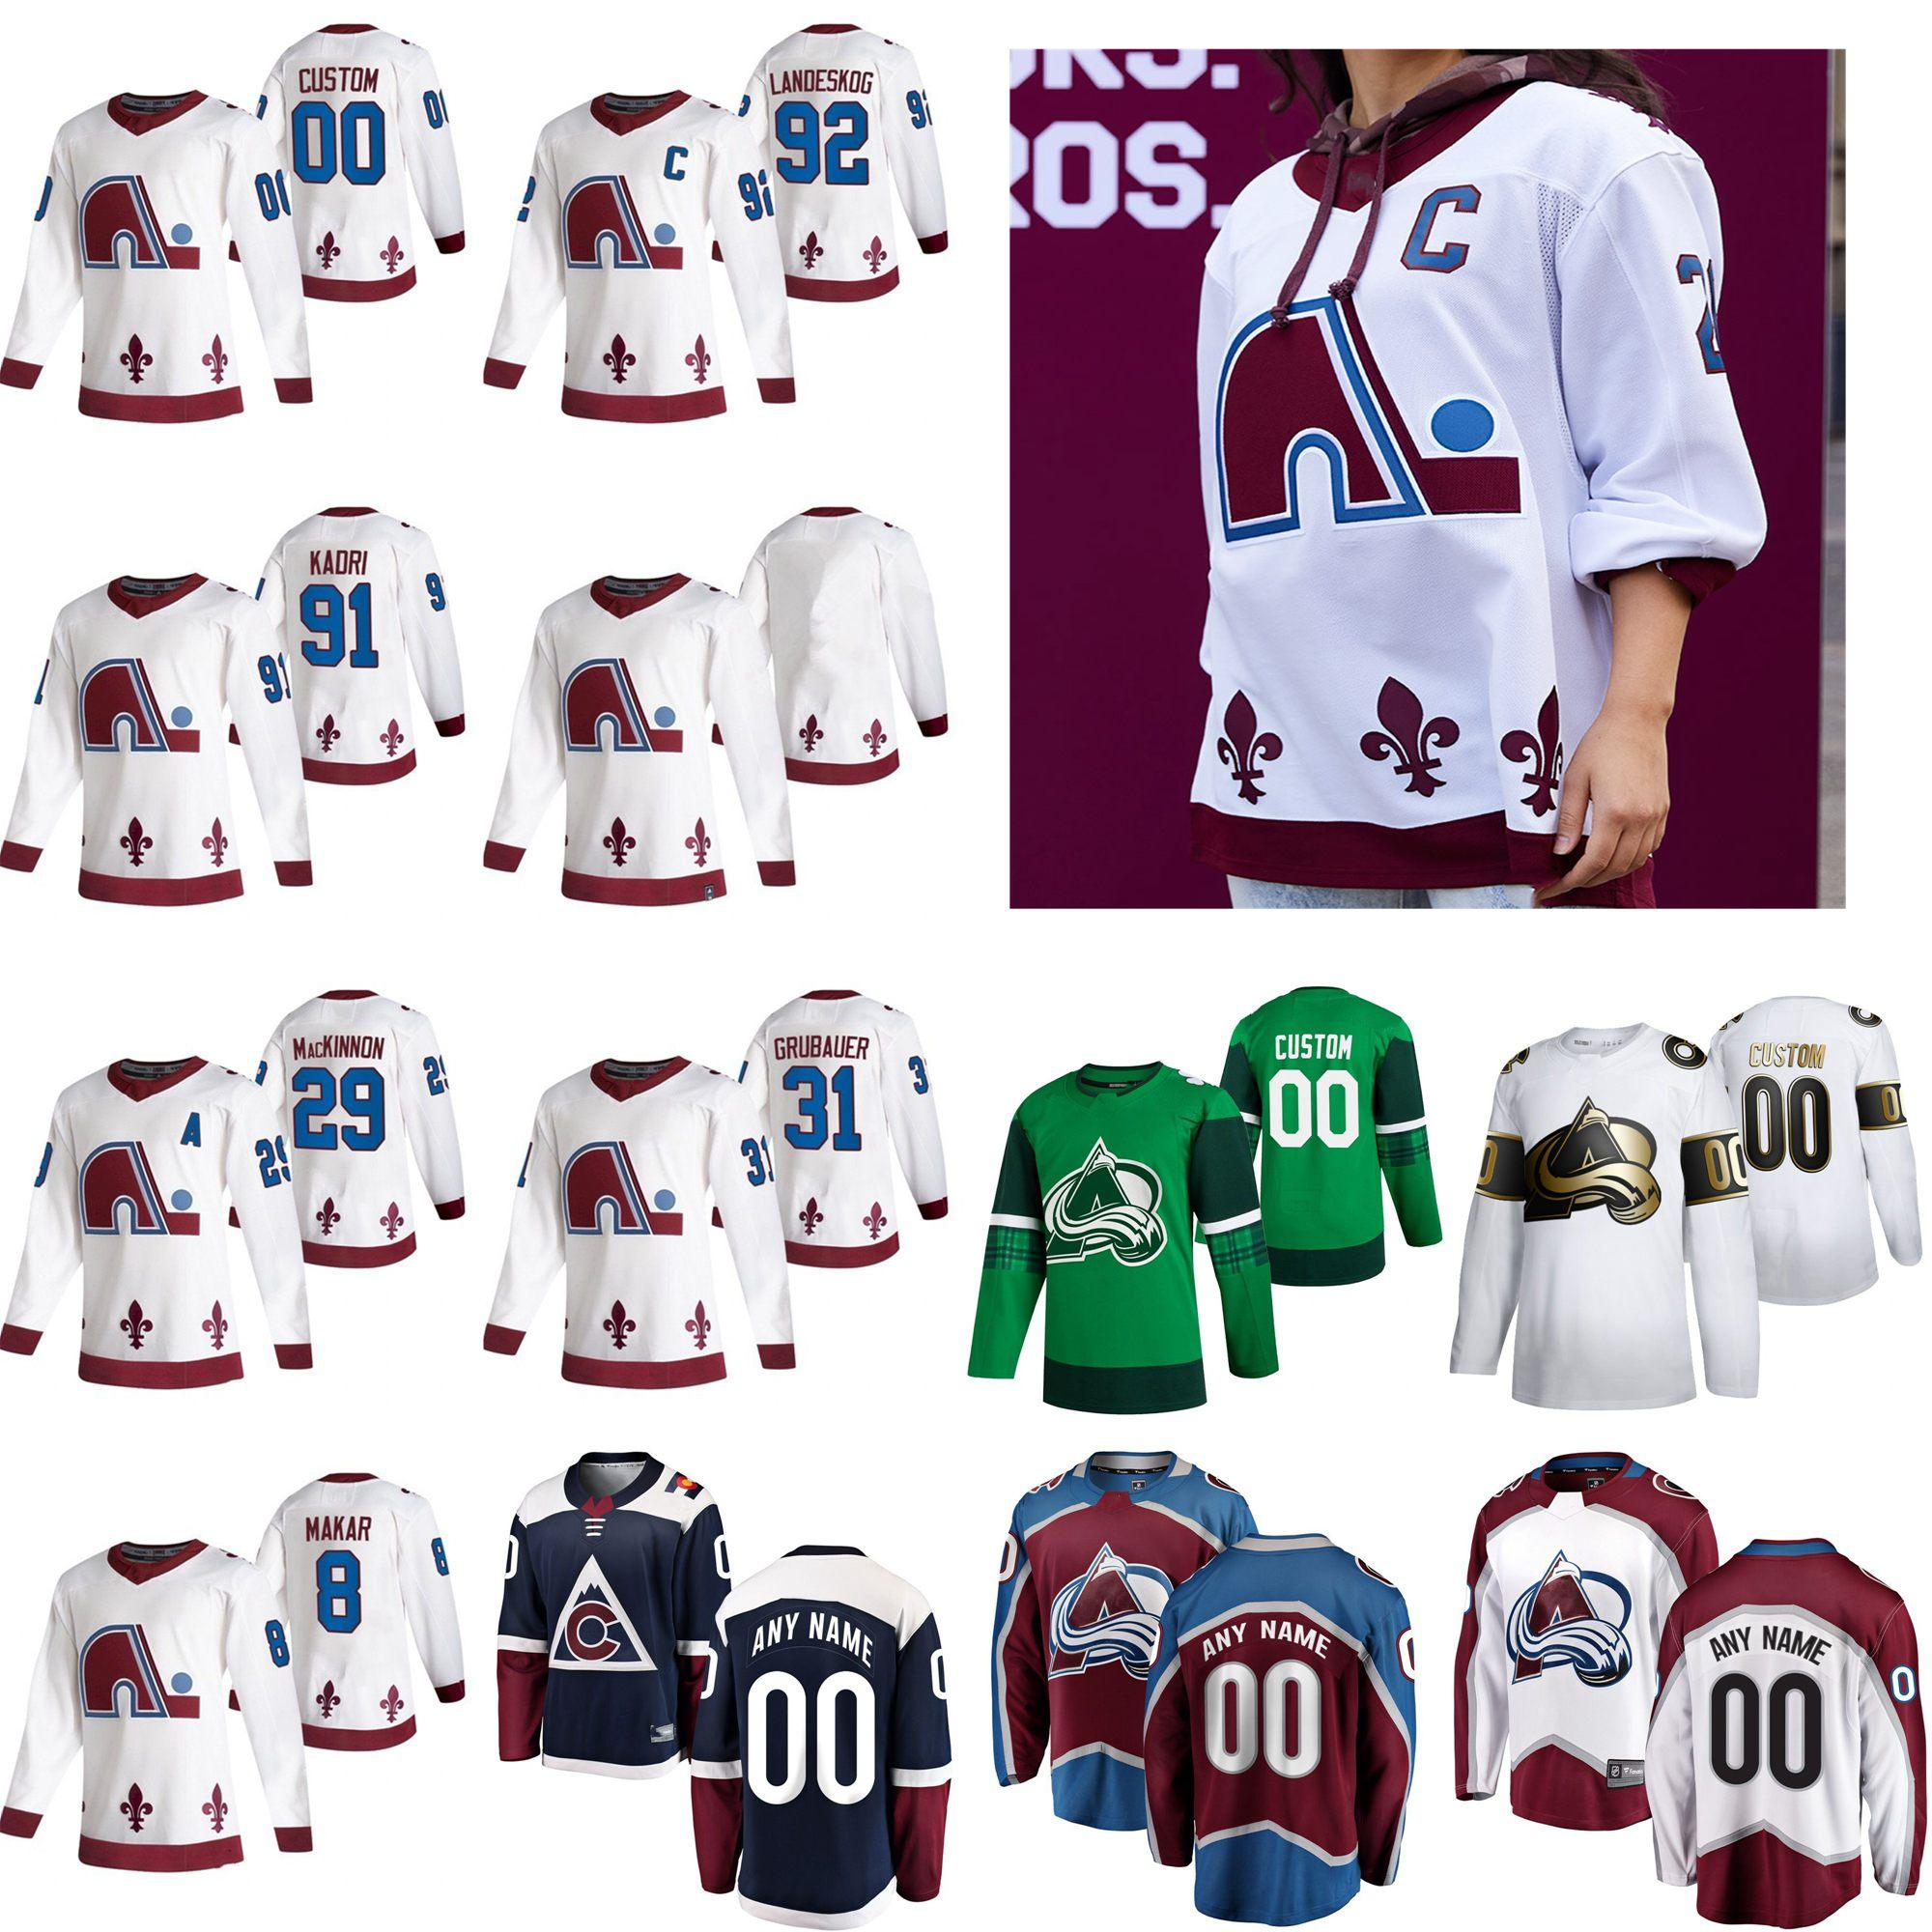 2021 Reverse Retro Colorado Avalanche Jersey Duncan Siemens Tyson Jost Nail Yakupov Mark Barberio Joonas Donskoi Hockey Jersey Stitch personalizzato